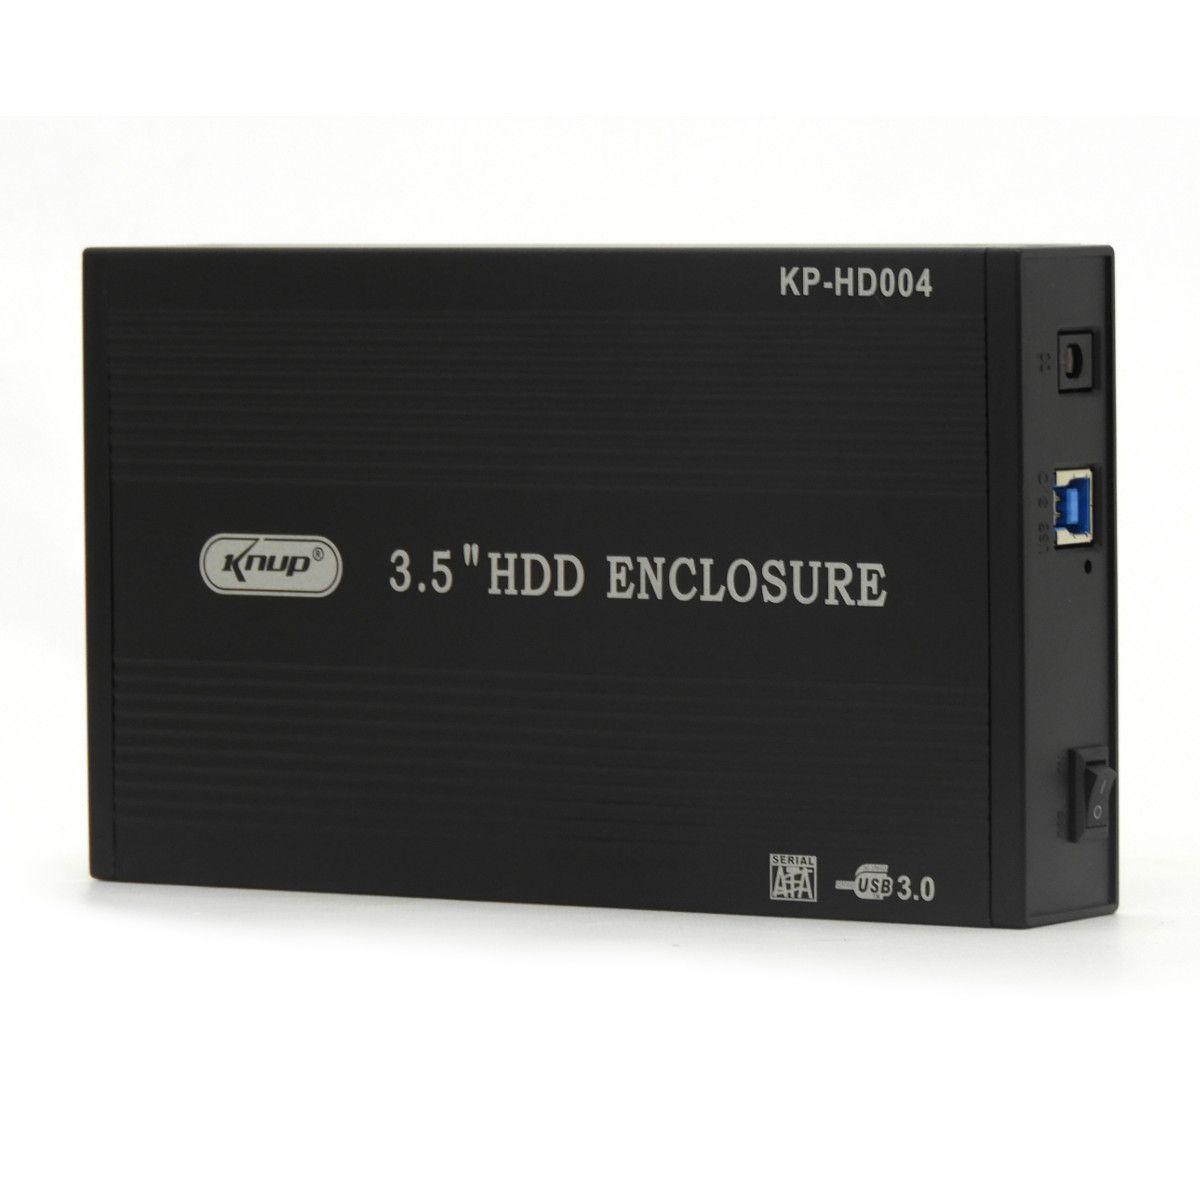 Case Para Hd 3,5 Pc Usb 3.0 Sata Uso Externo Knup Hd004